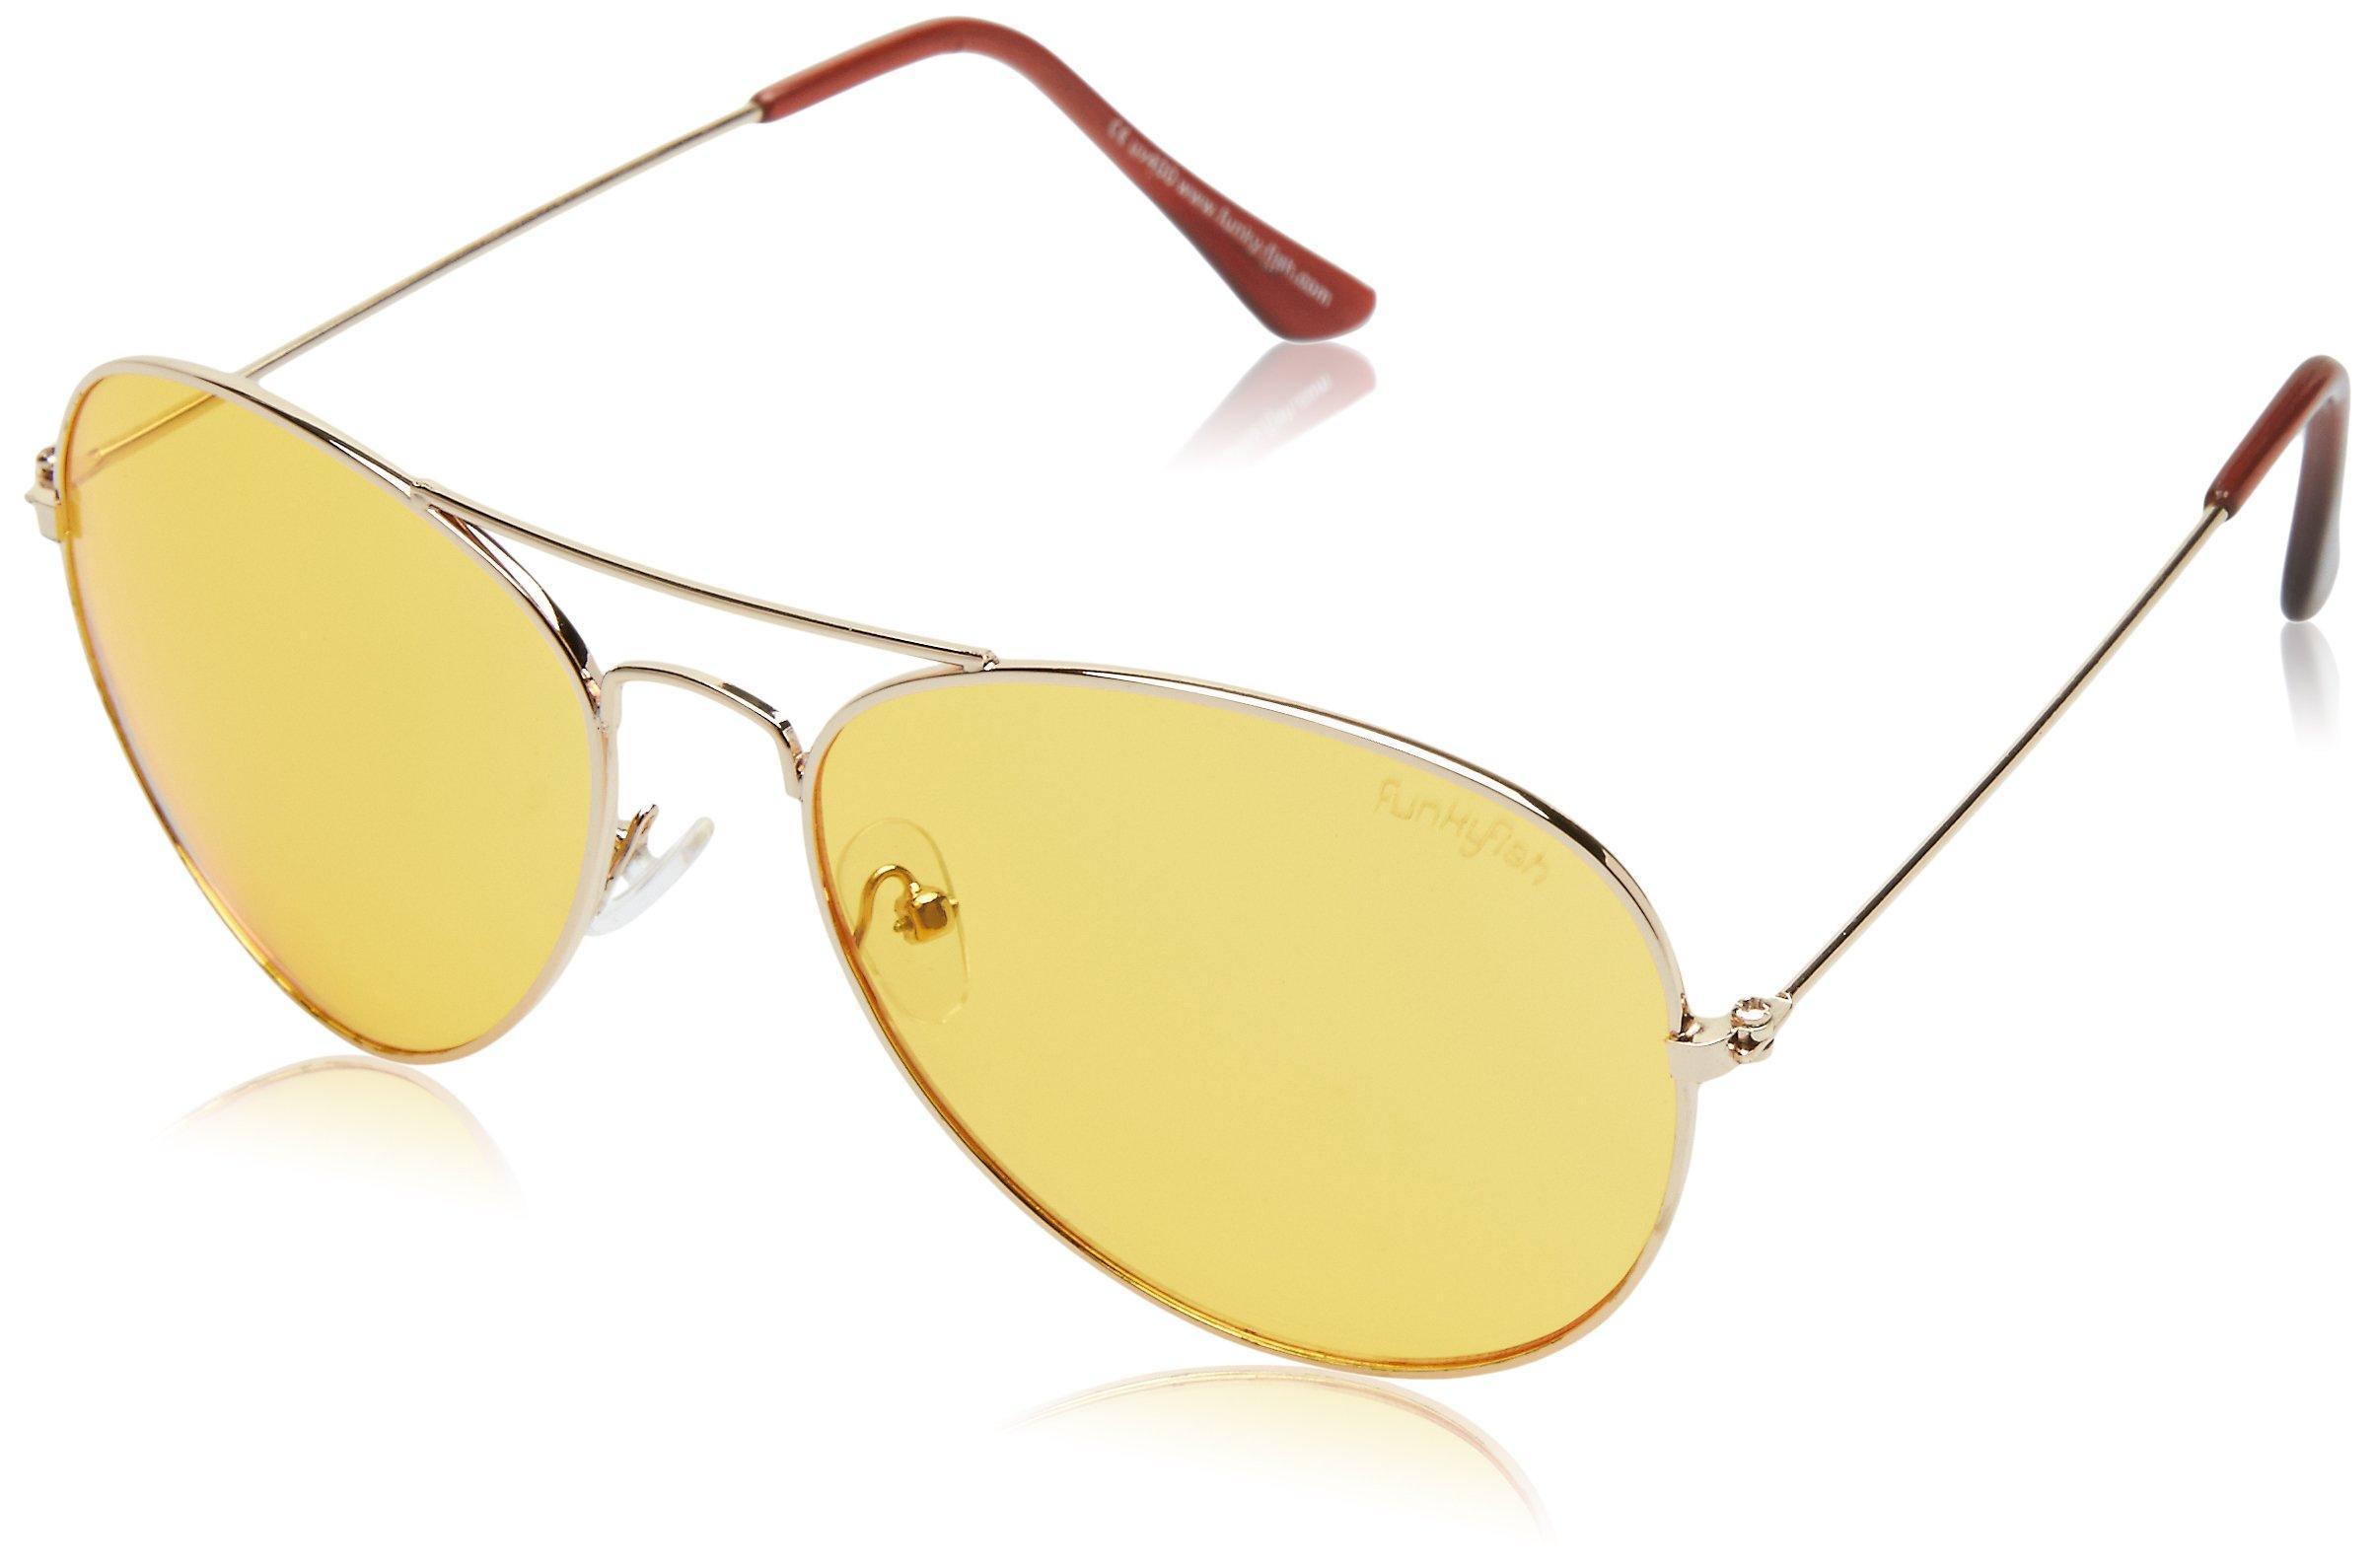 822d4e94009 Aviator Unisex Sunglasses - SeenIt